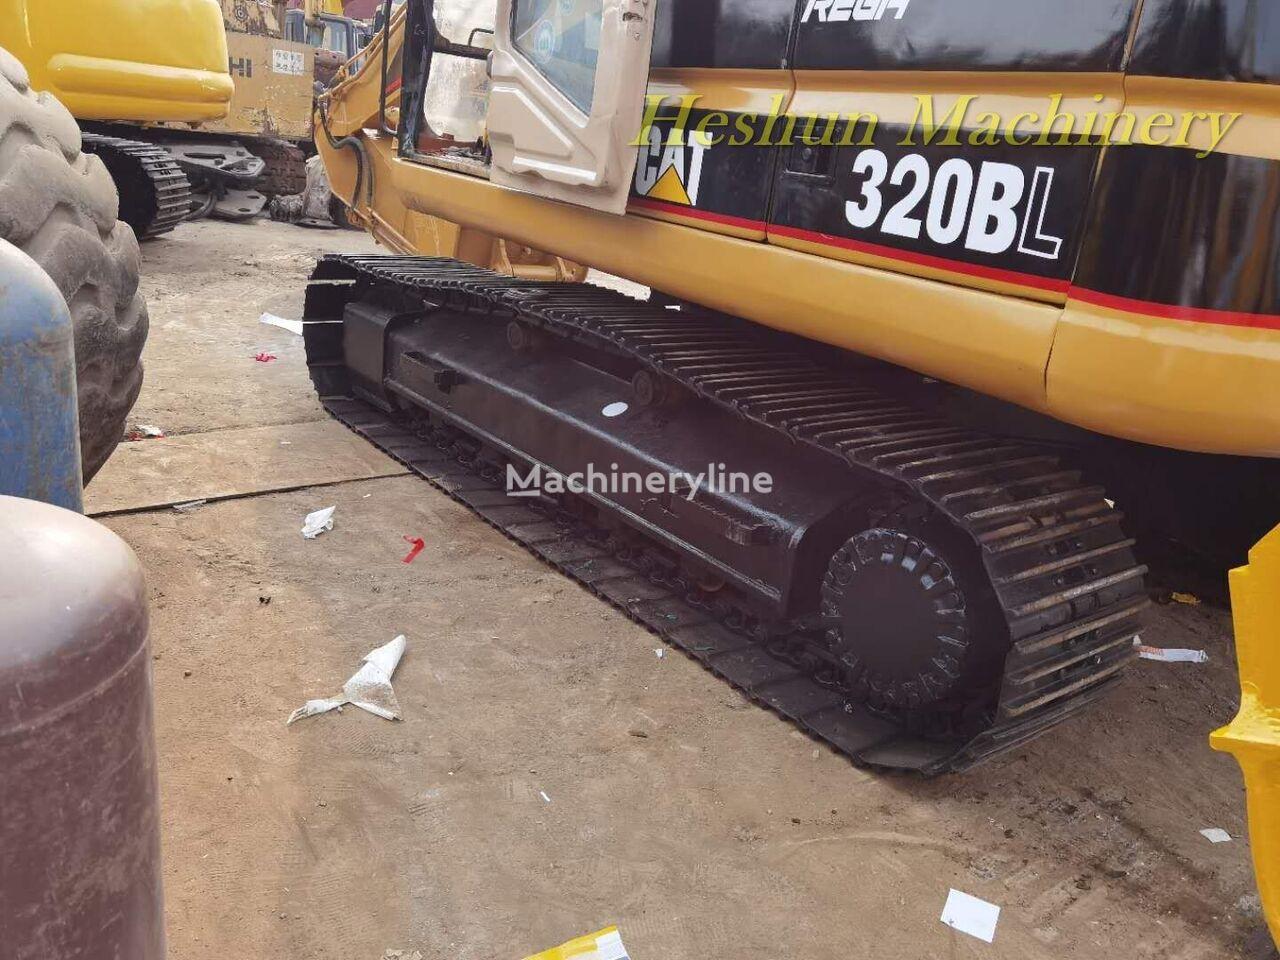 CATERPILLAR 320BL tracked excavator